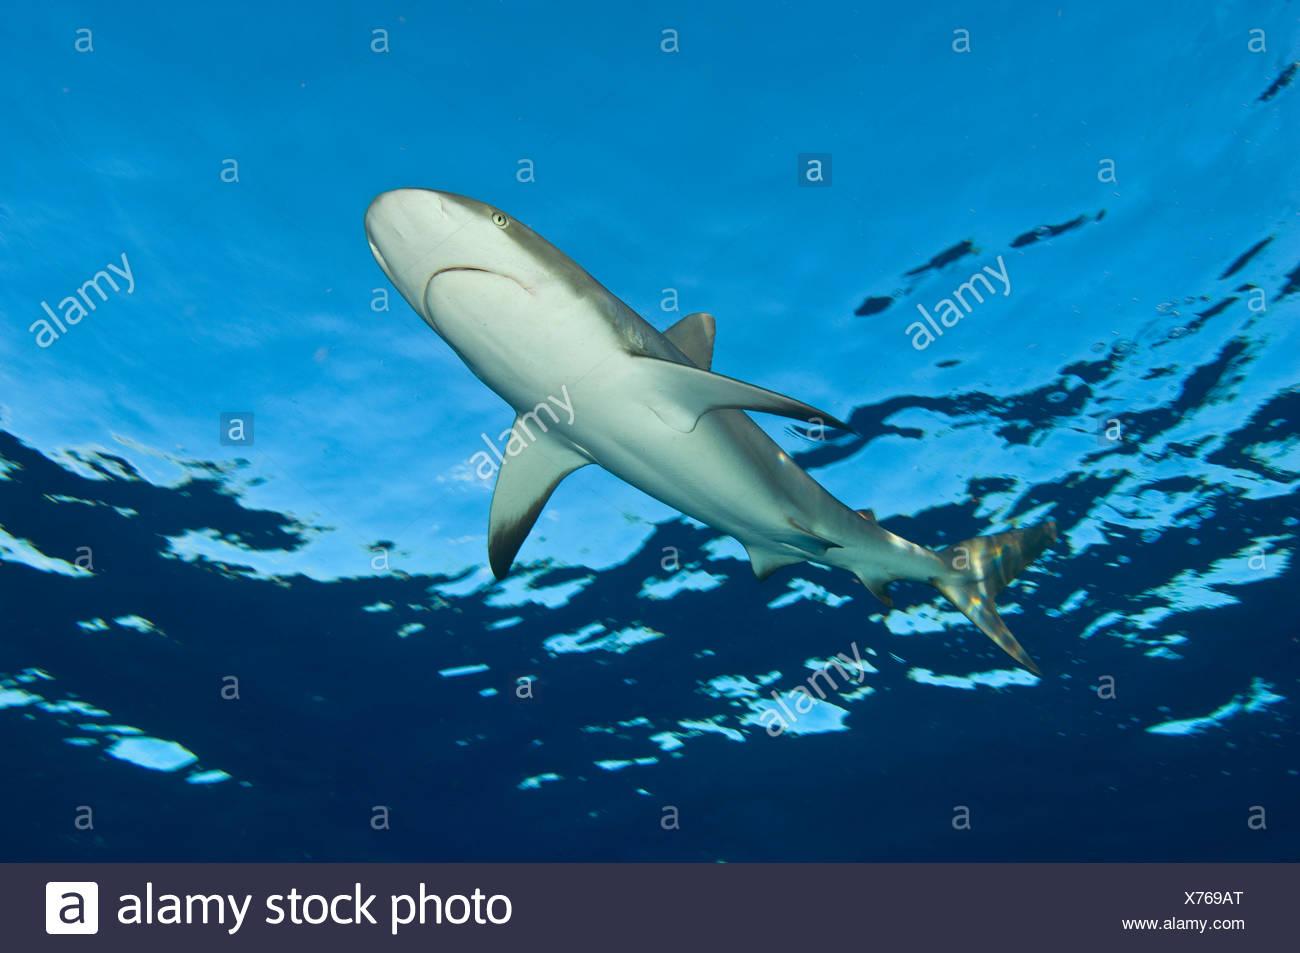 Niedrigen Winkel Bild des karibischen Riffhai (Carcharhinus Perezi) an der Oberfläche. Grand Bahama, Bahamas. Tropischen West-Atlantik. Stockbild